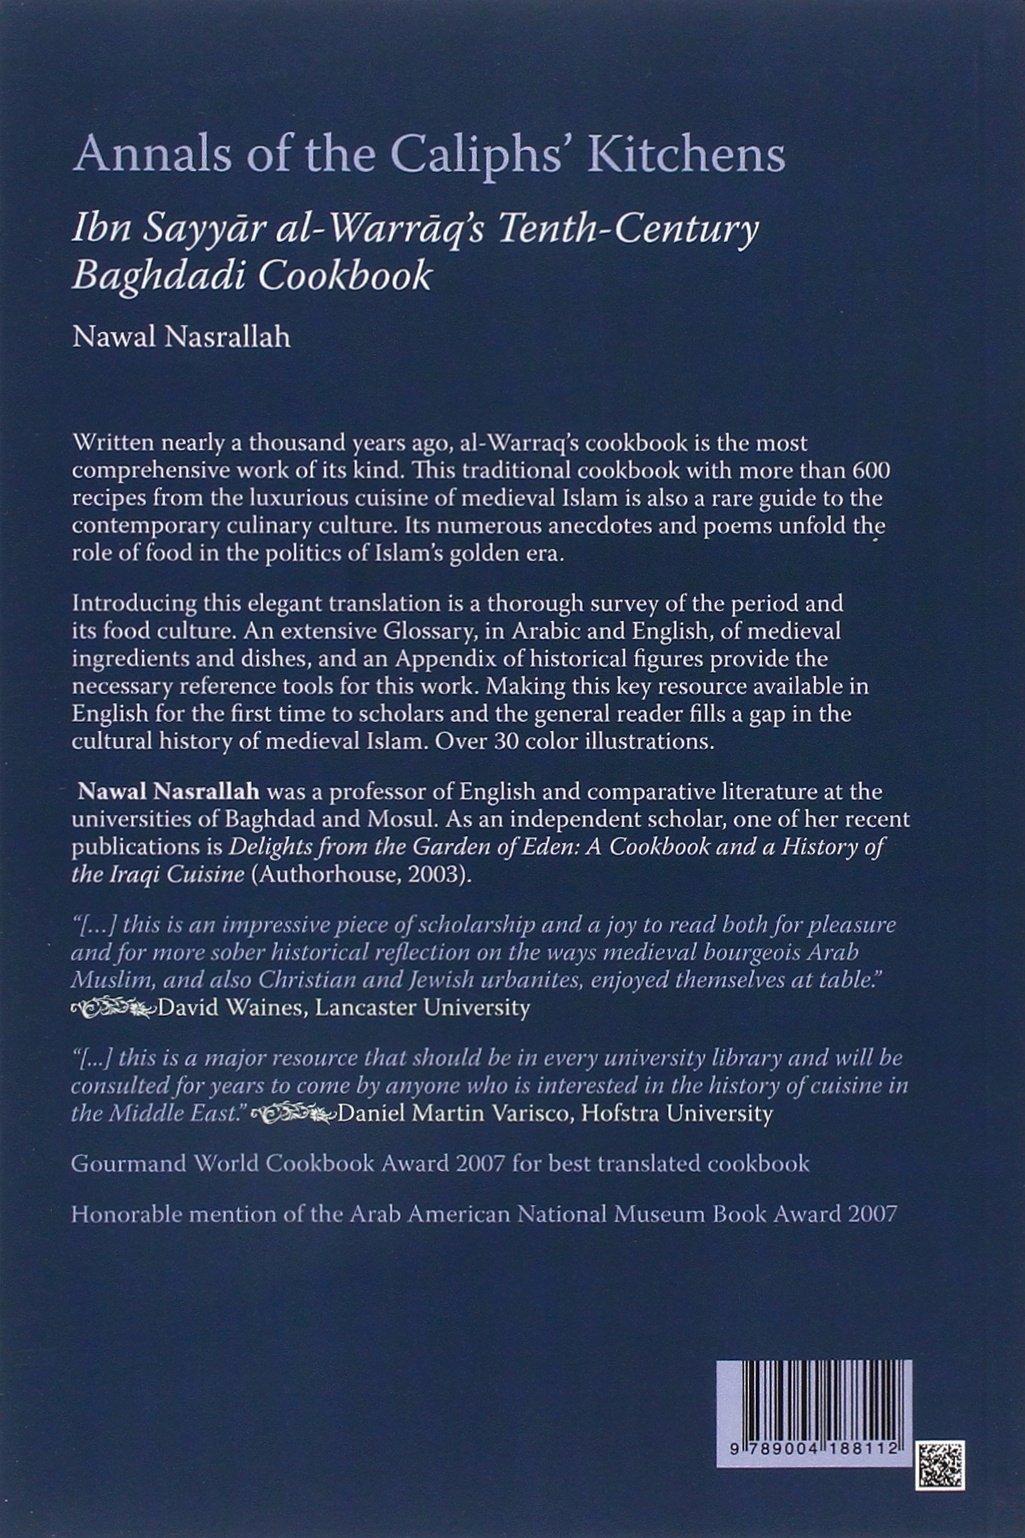 annals of the caliphs kitchens nawal nasrallah 9789004188112 amazoncom books